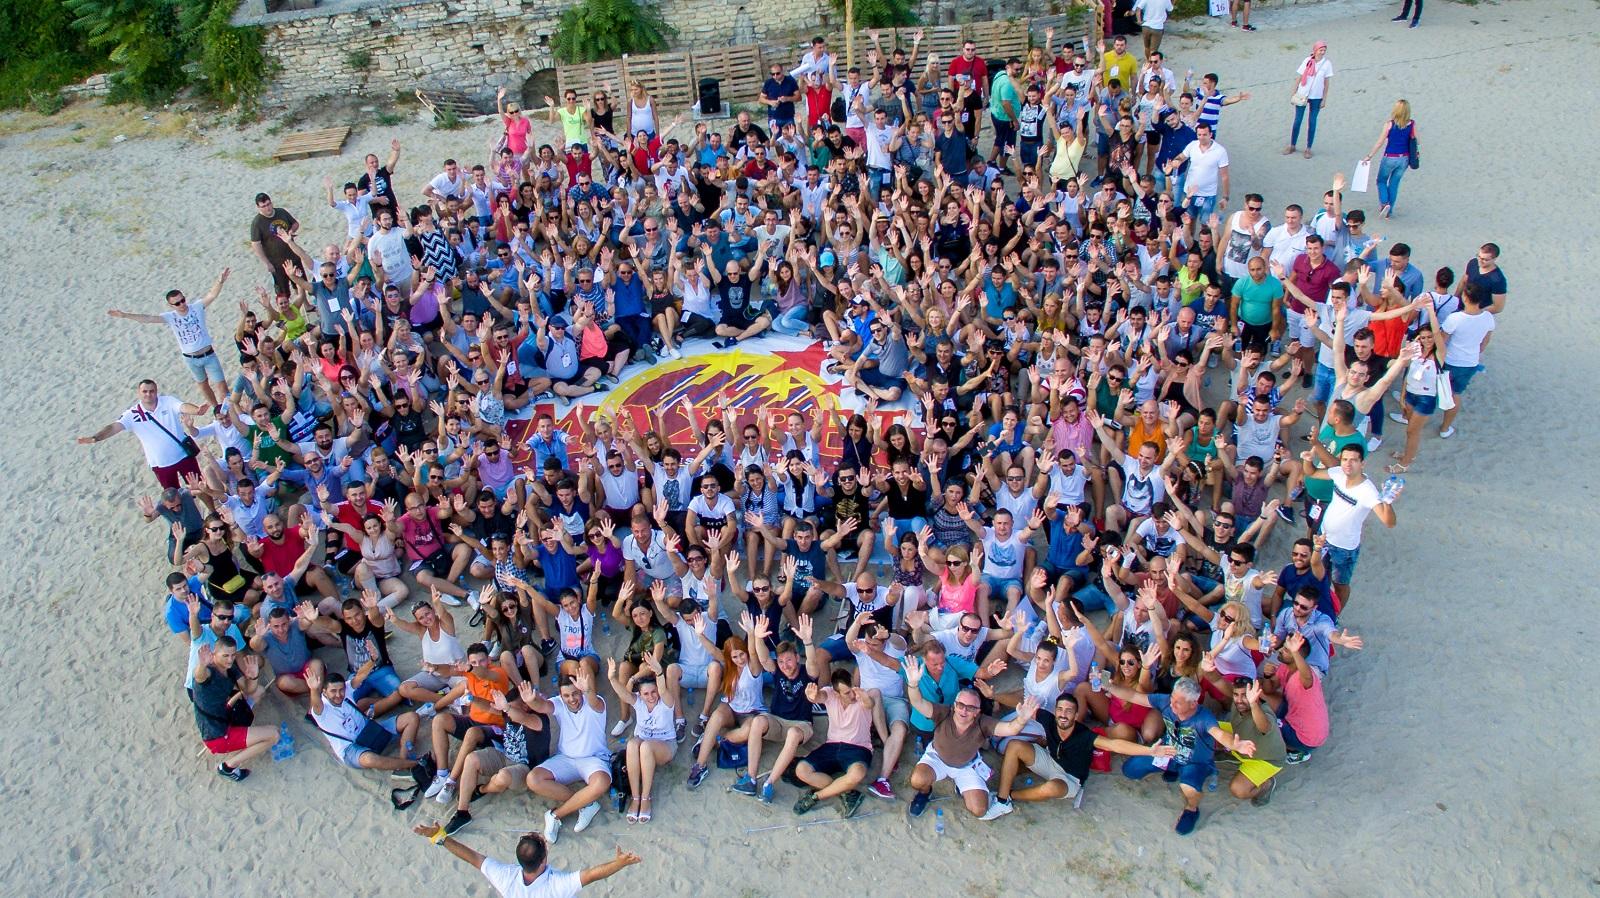 MaxBet România: 99% din promovări sunt interne